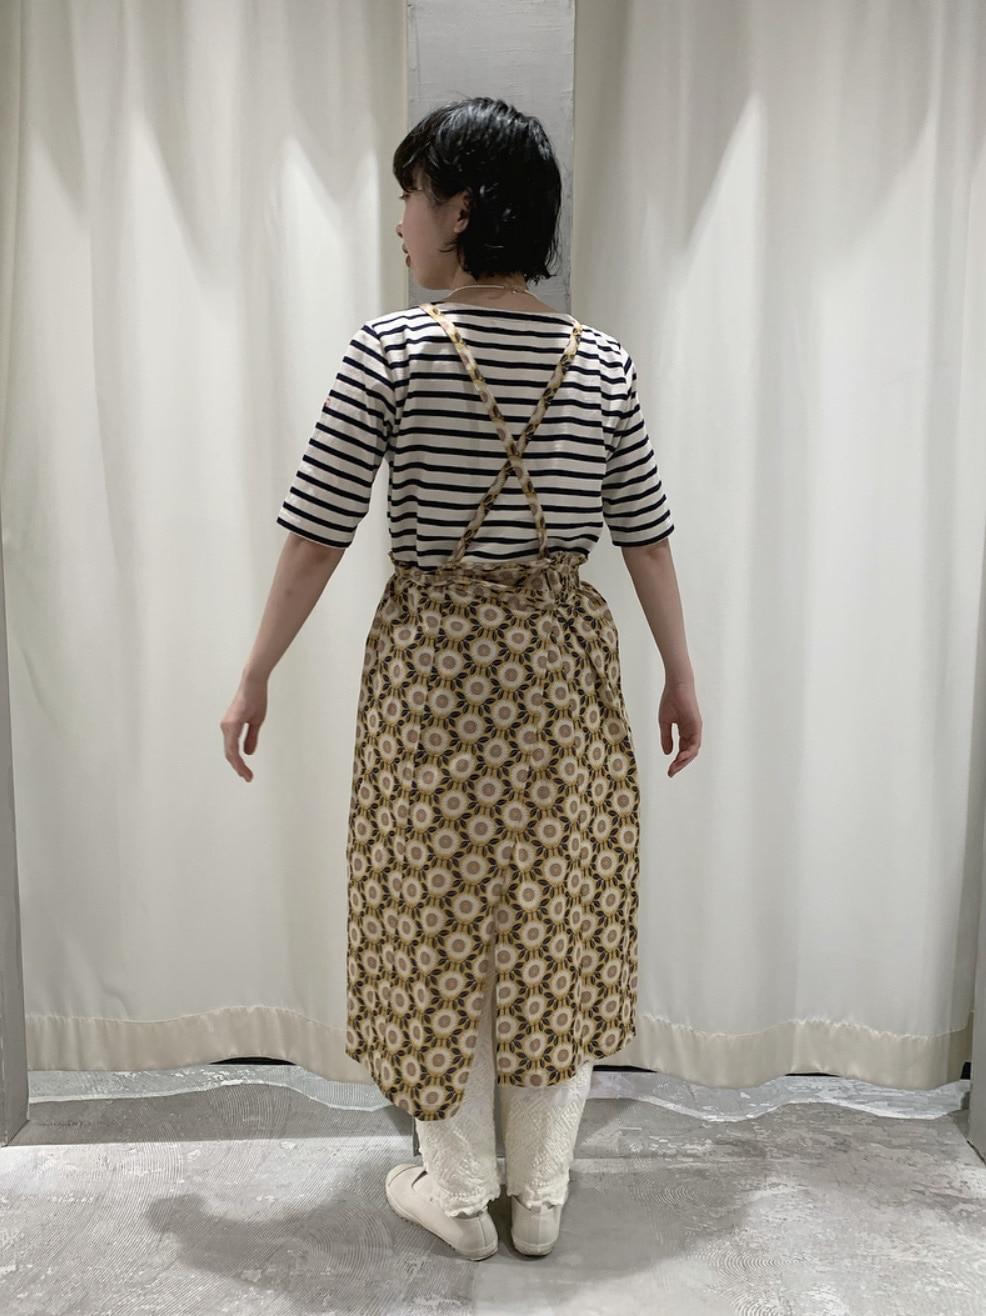 - CHILD WOMAN CHILD WOMAN , PAR ICI ルミネ横浜 身長:158cm 2020.08.14